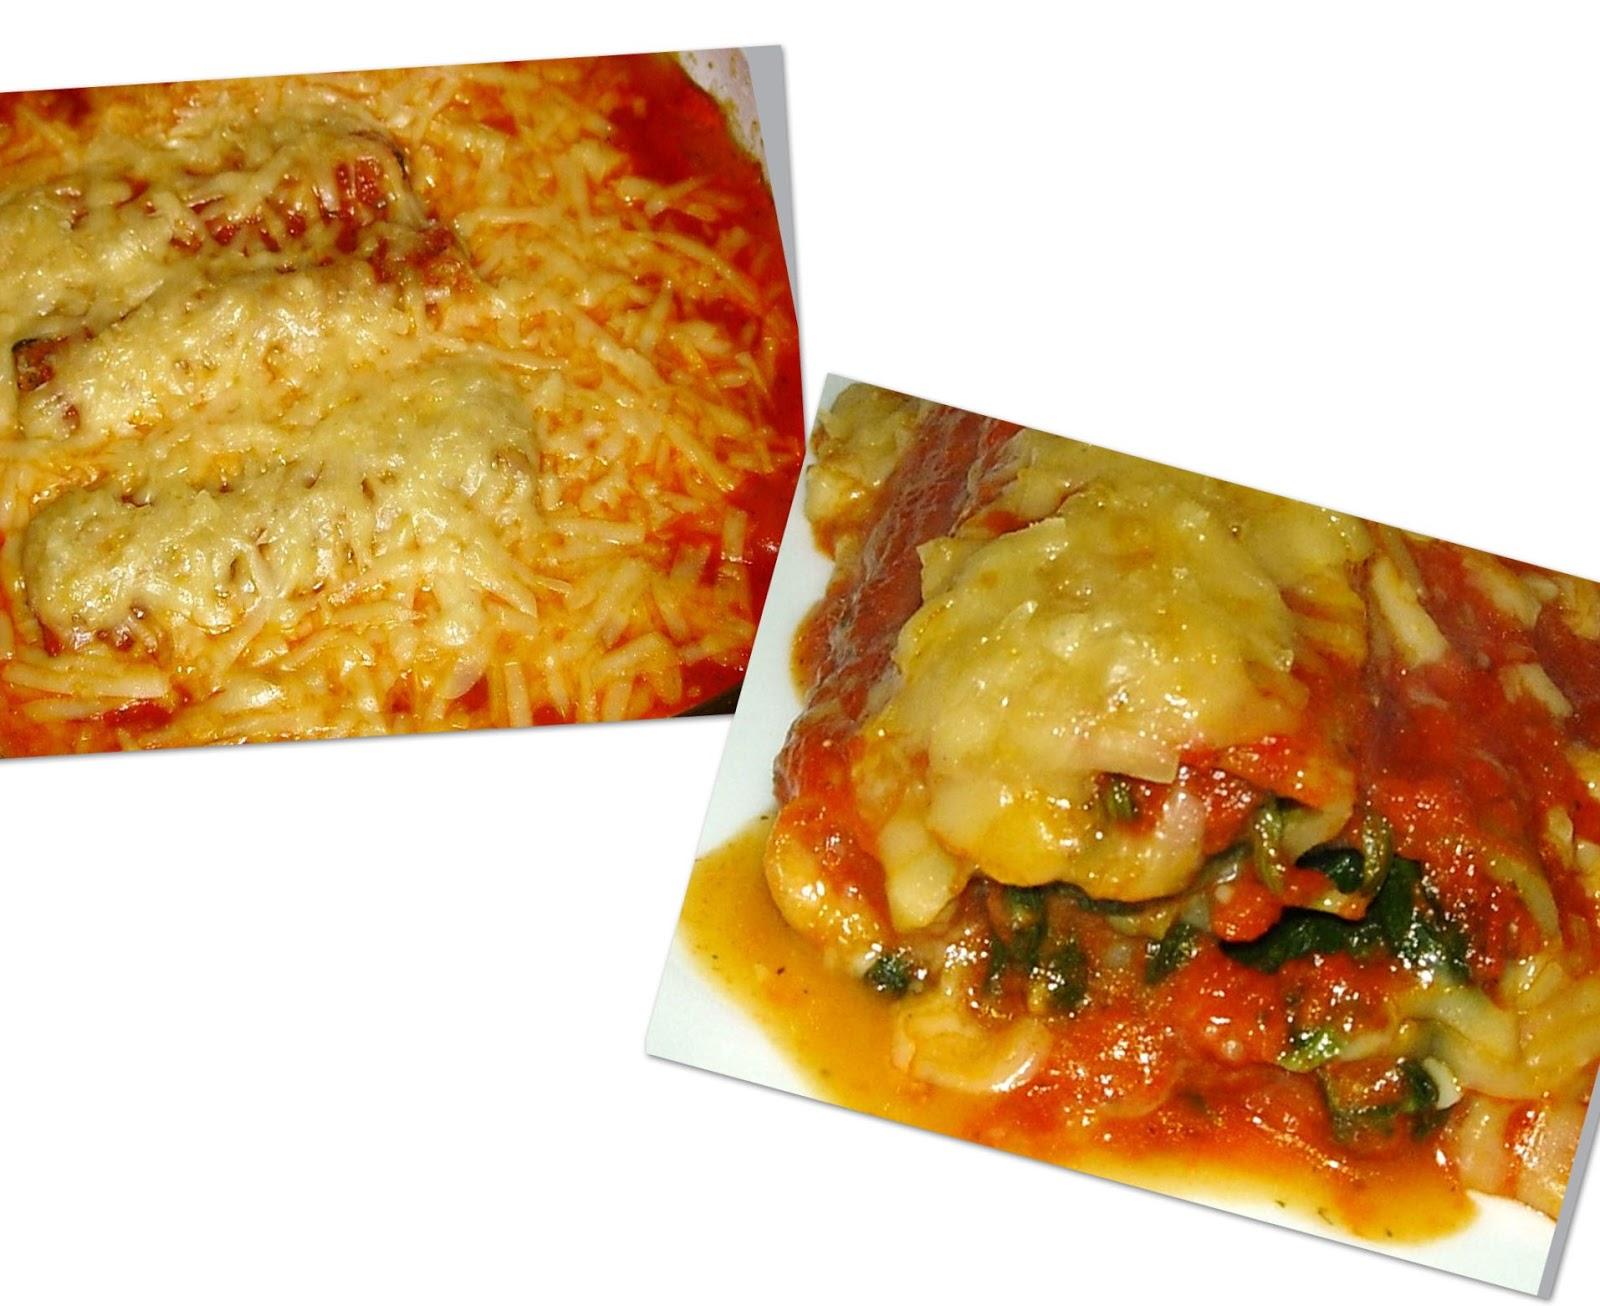 tuffi is dann mal veg cannelloni mit spinat k se f llung. Black Bedroom Furniture Sets. Home Design Ideas